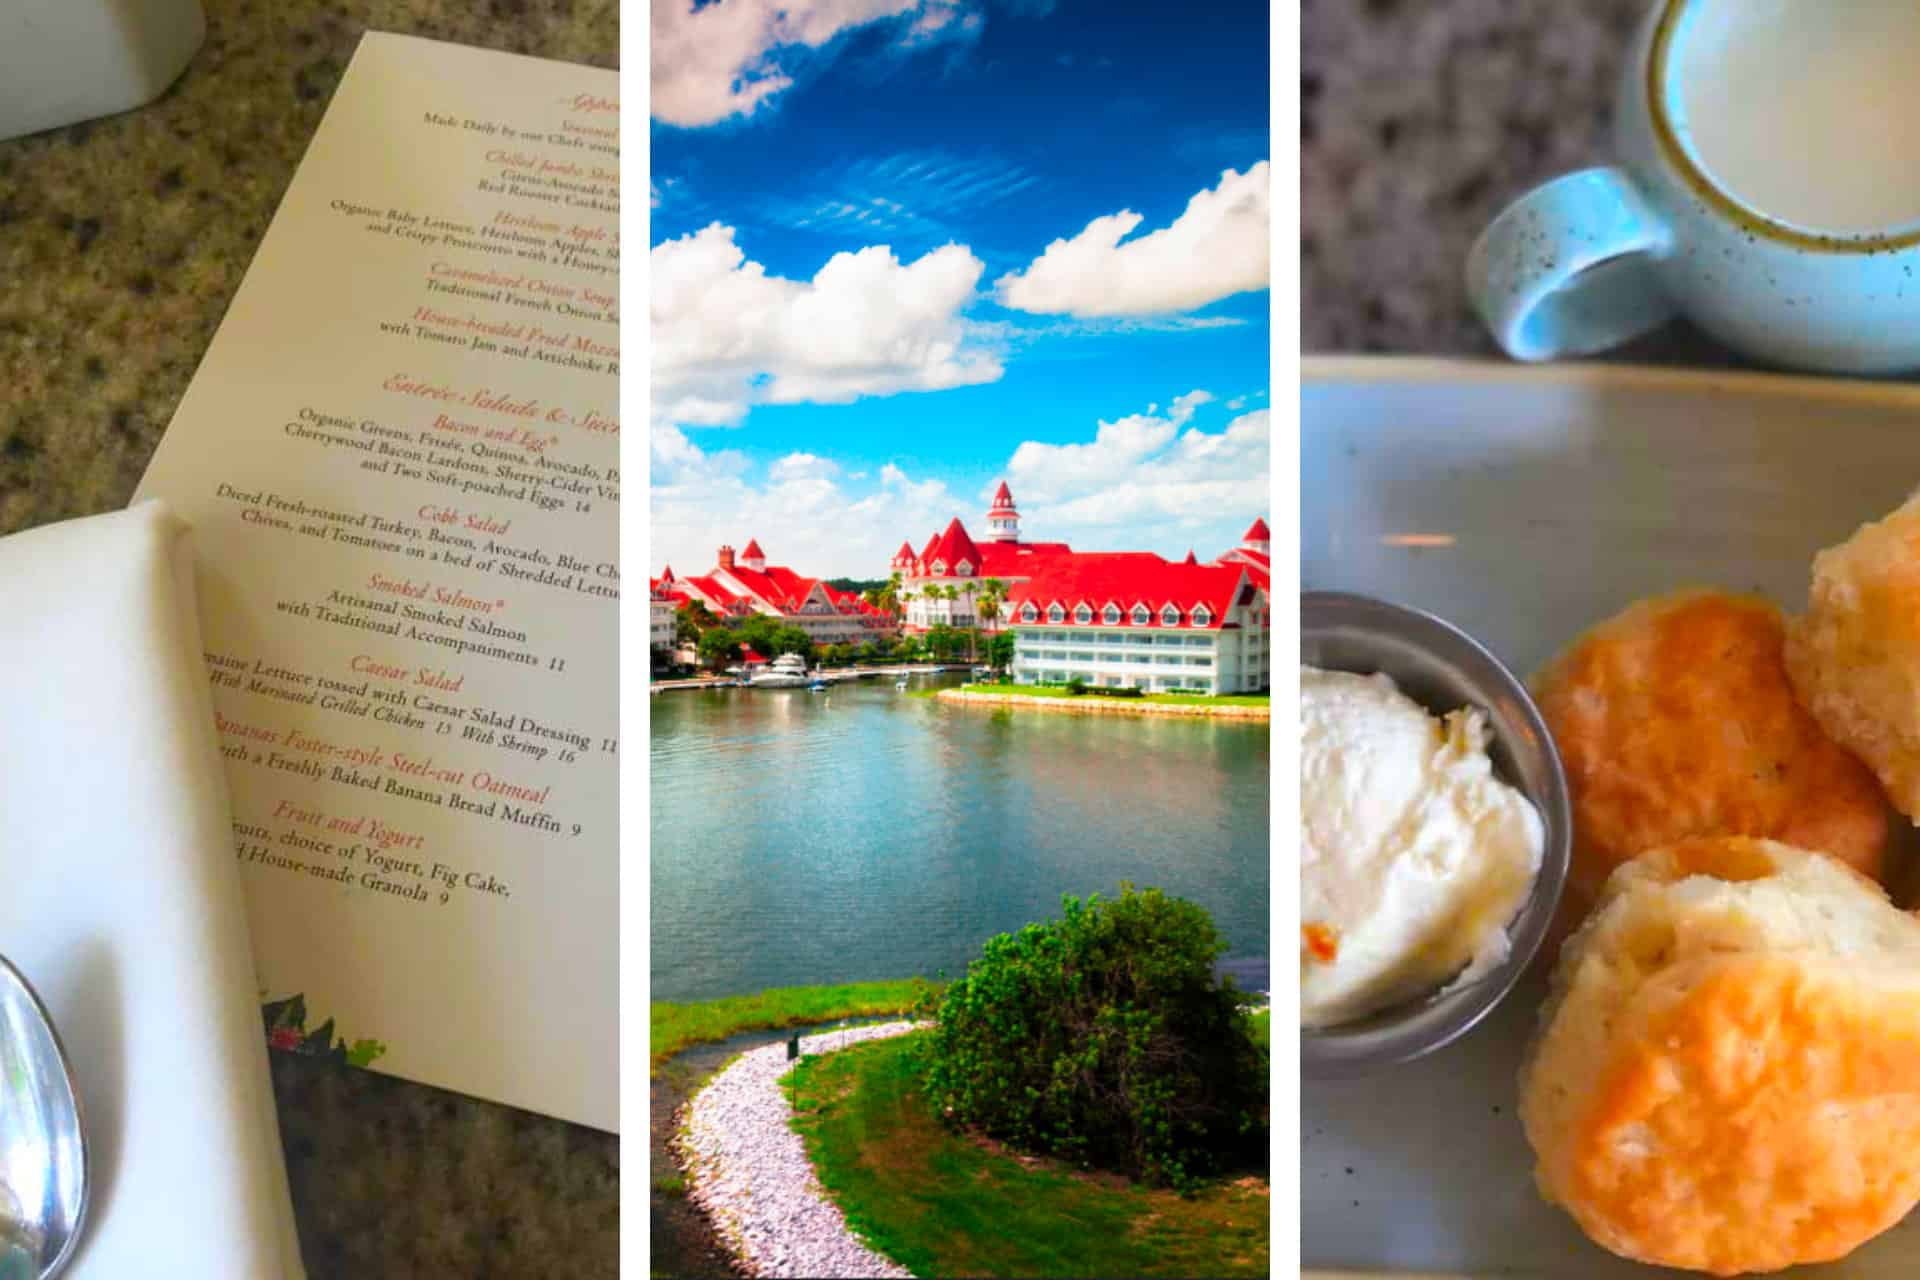 2021 Disney's Grand Floridian Cafe Breakfast Review (+ Photos!) via @allamericanatlas